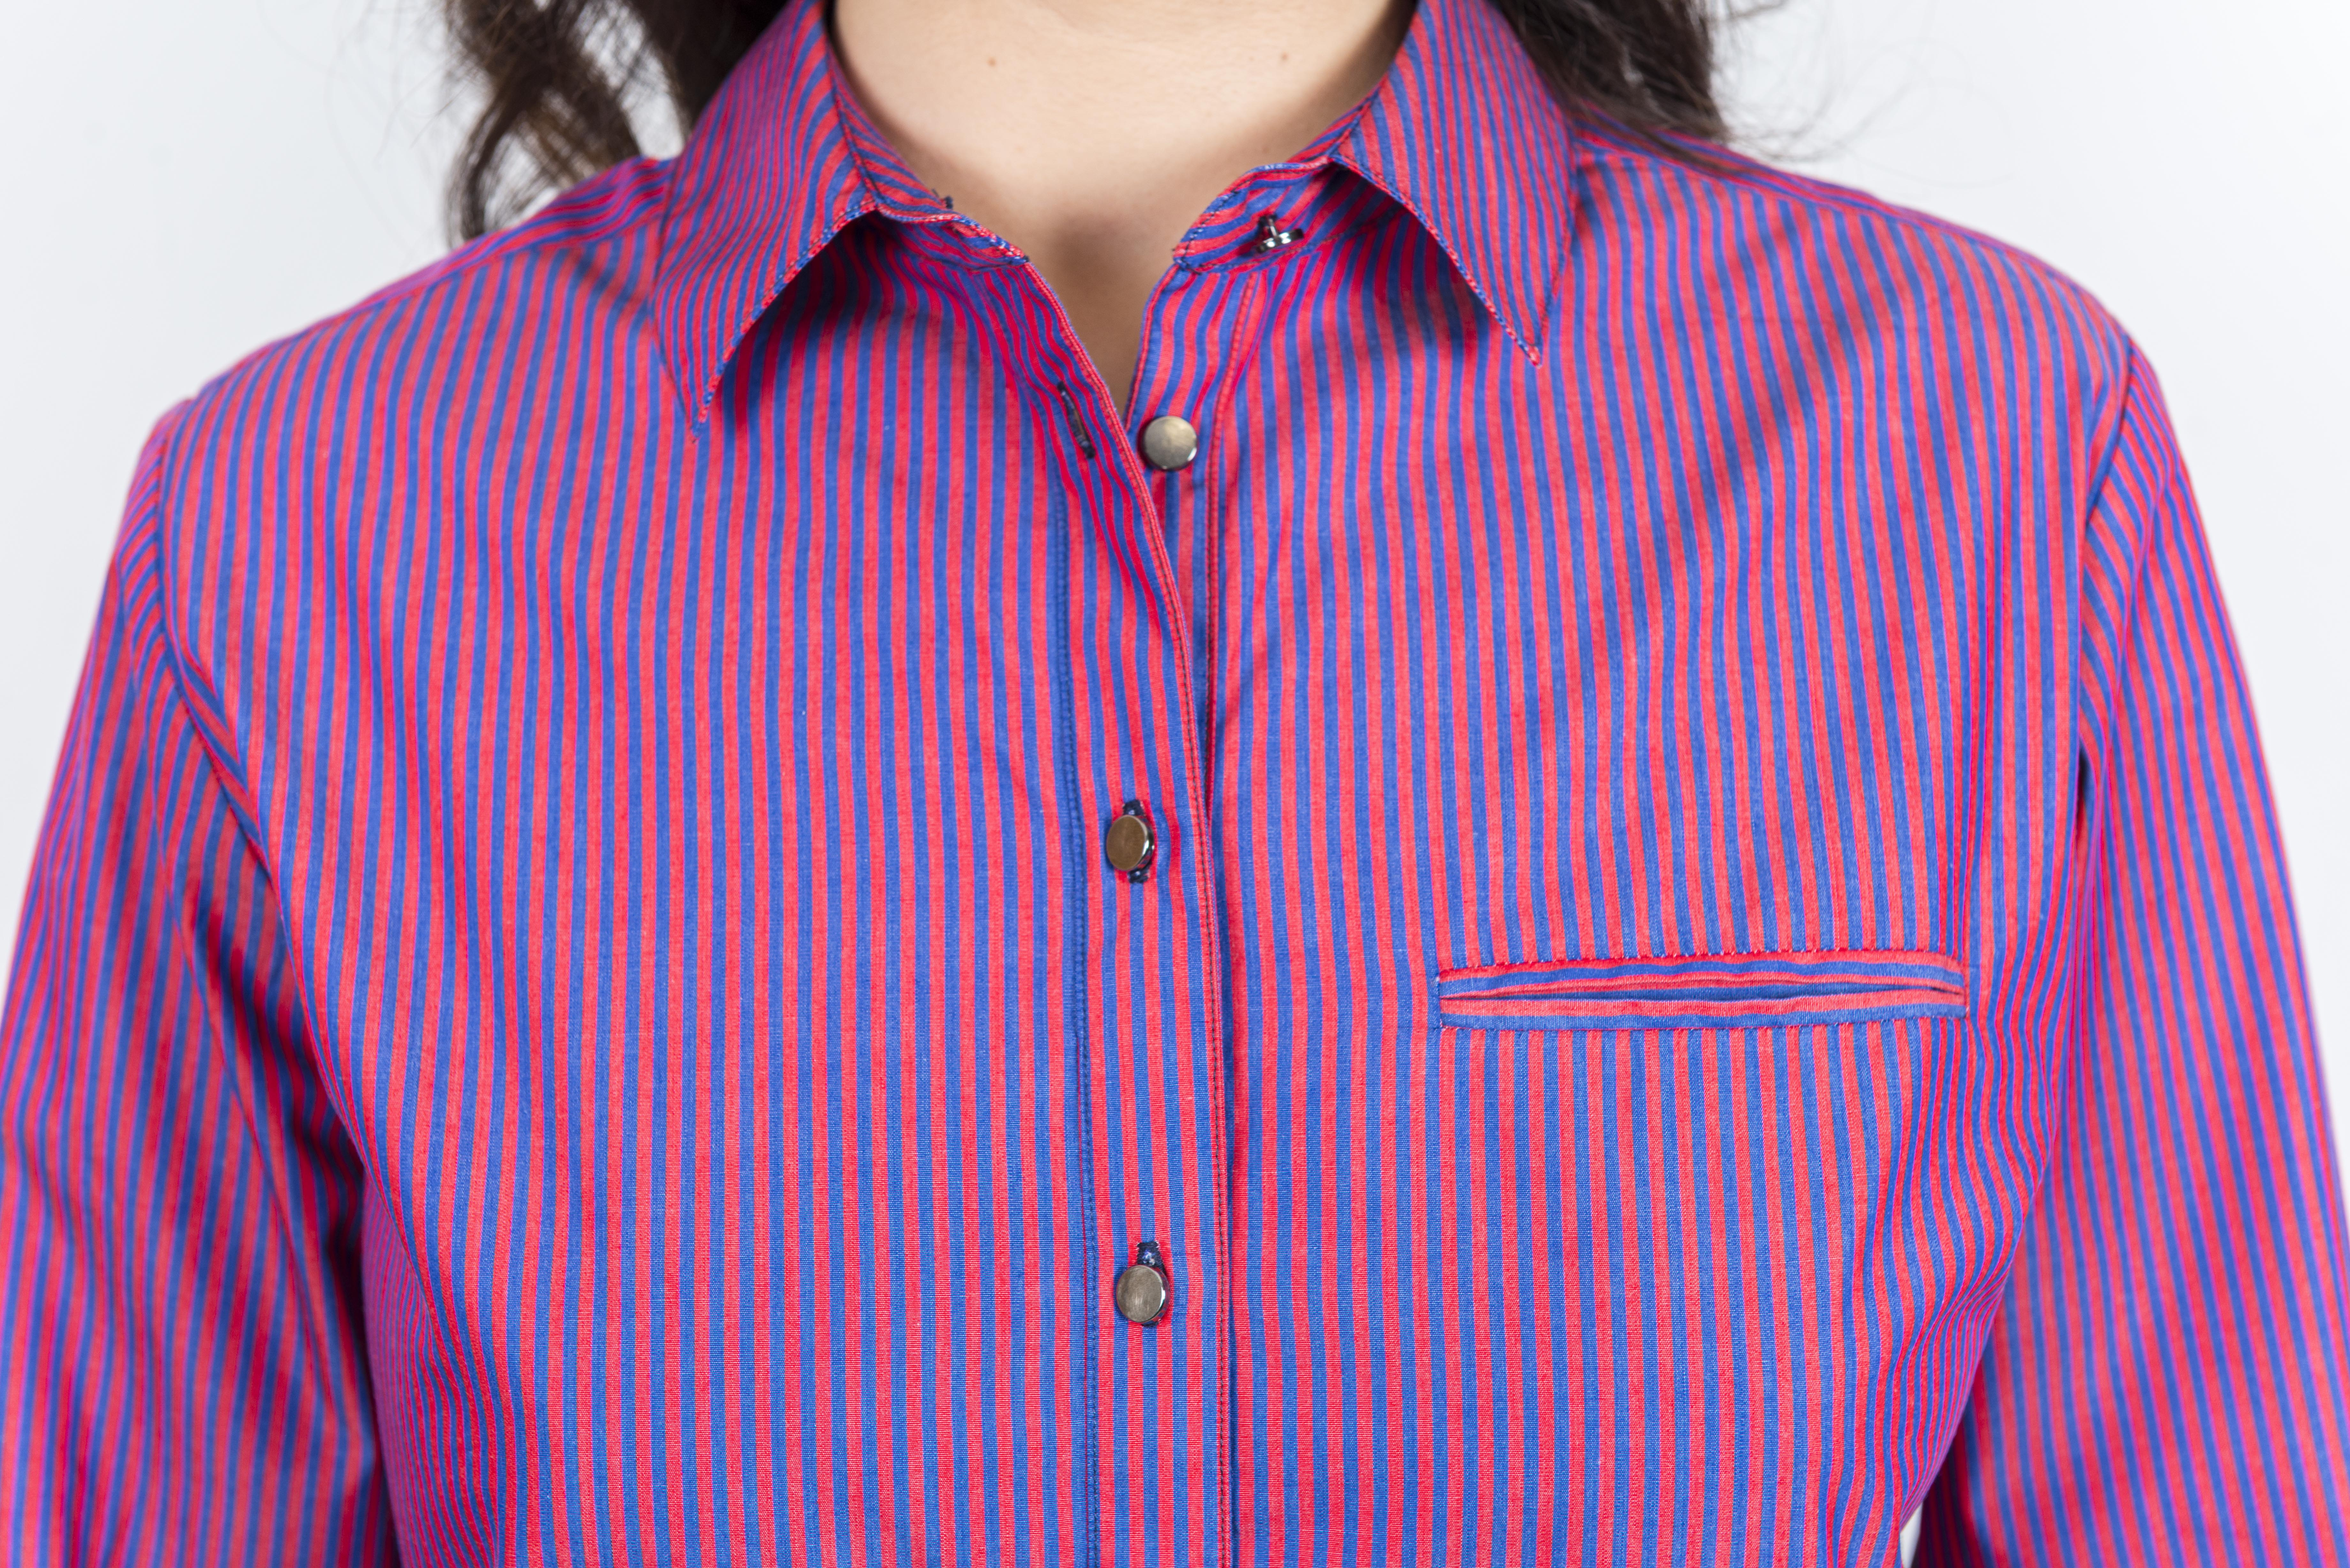 Summer Women's Cotton Tops Full Sleeve